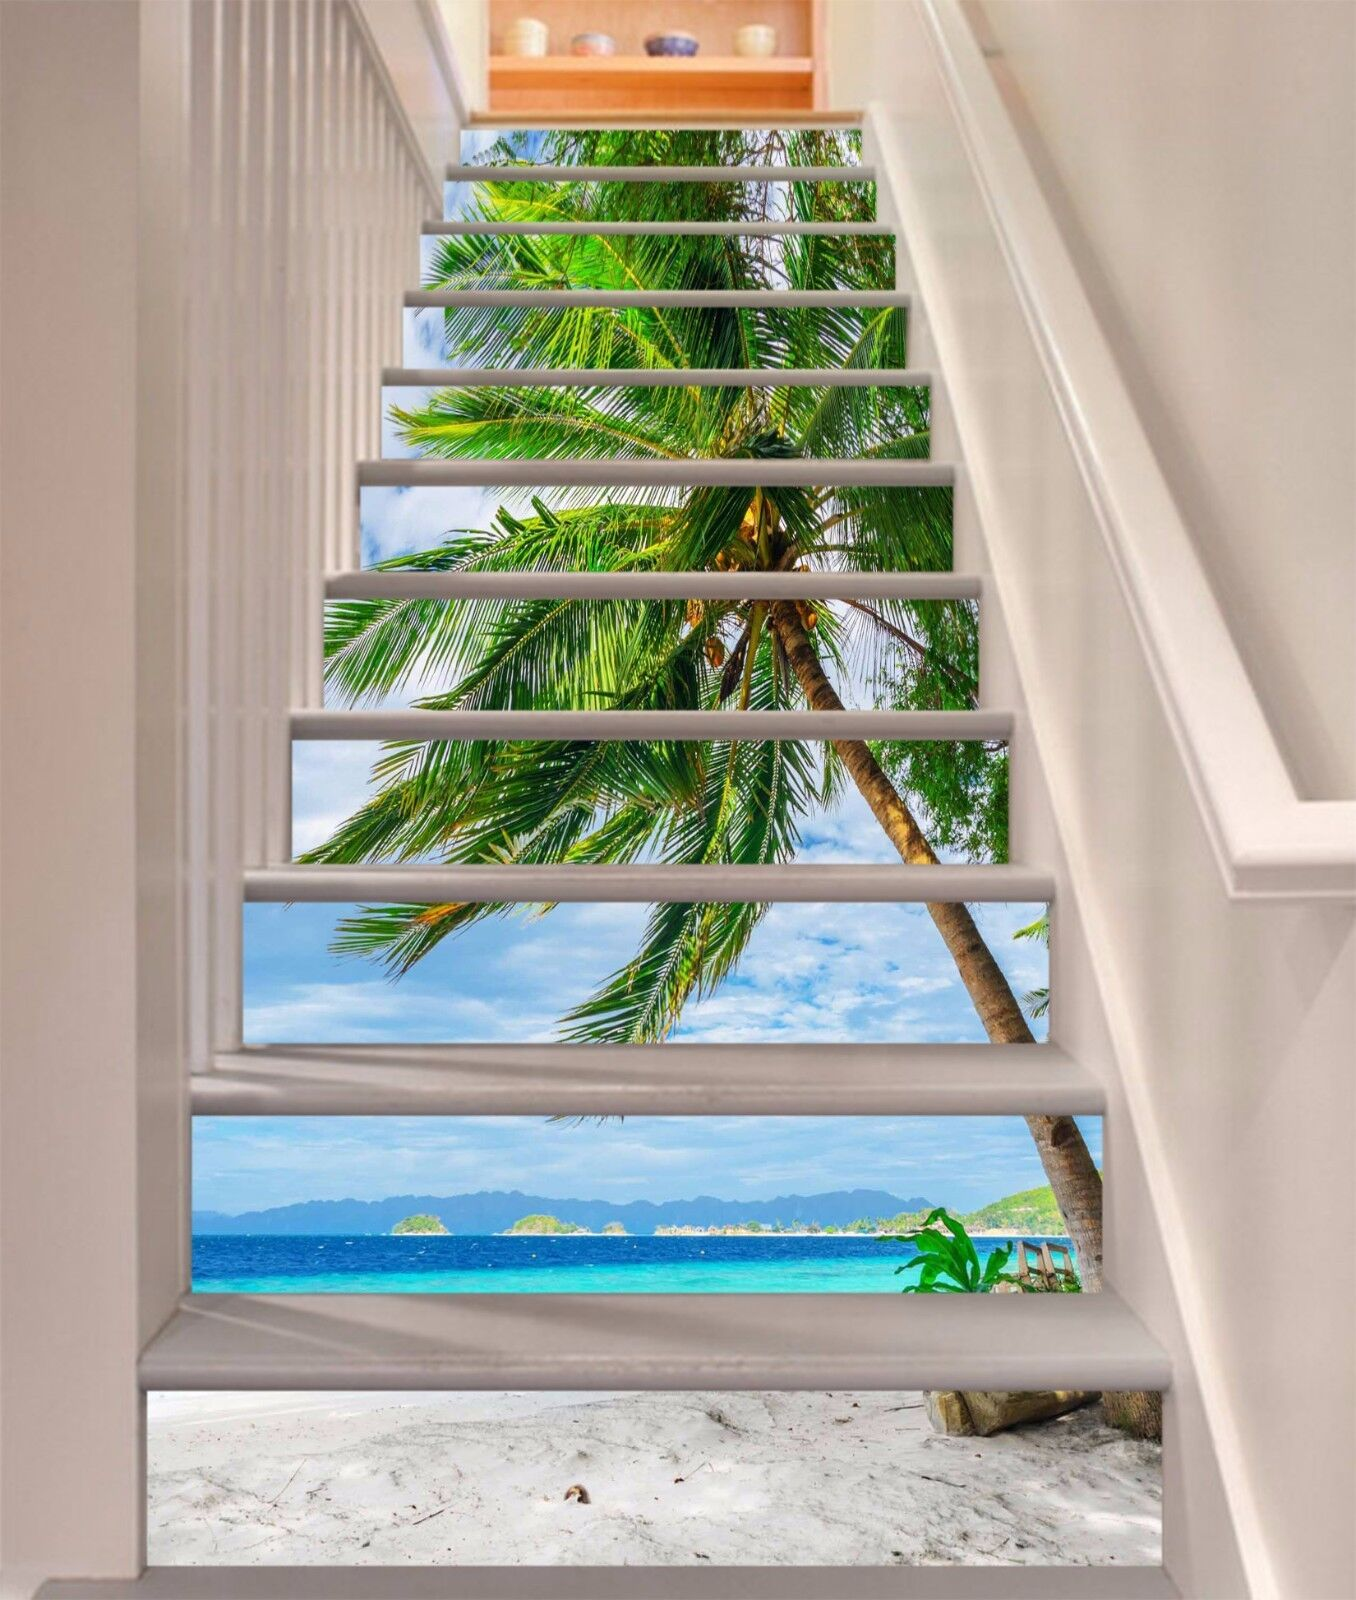 3D Beach Tree 801 Stair Risers Decoration Photo Mural Vinyl Decal Wallpaper UK